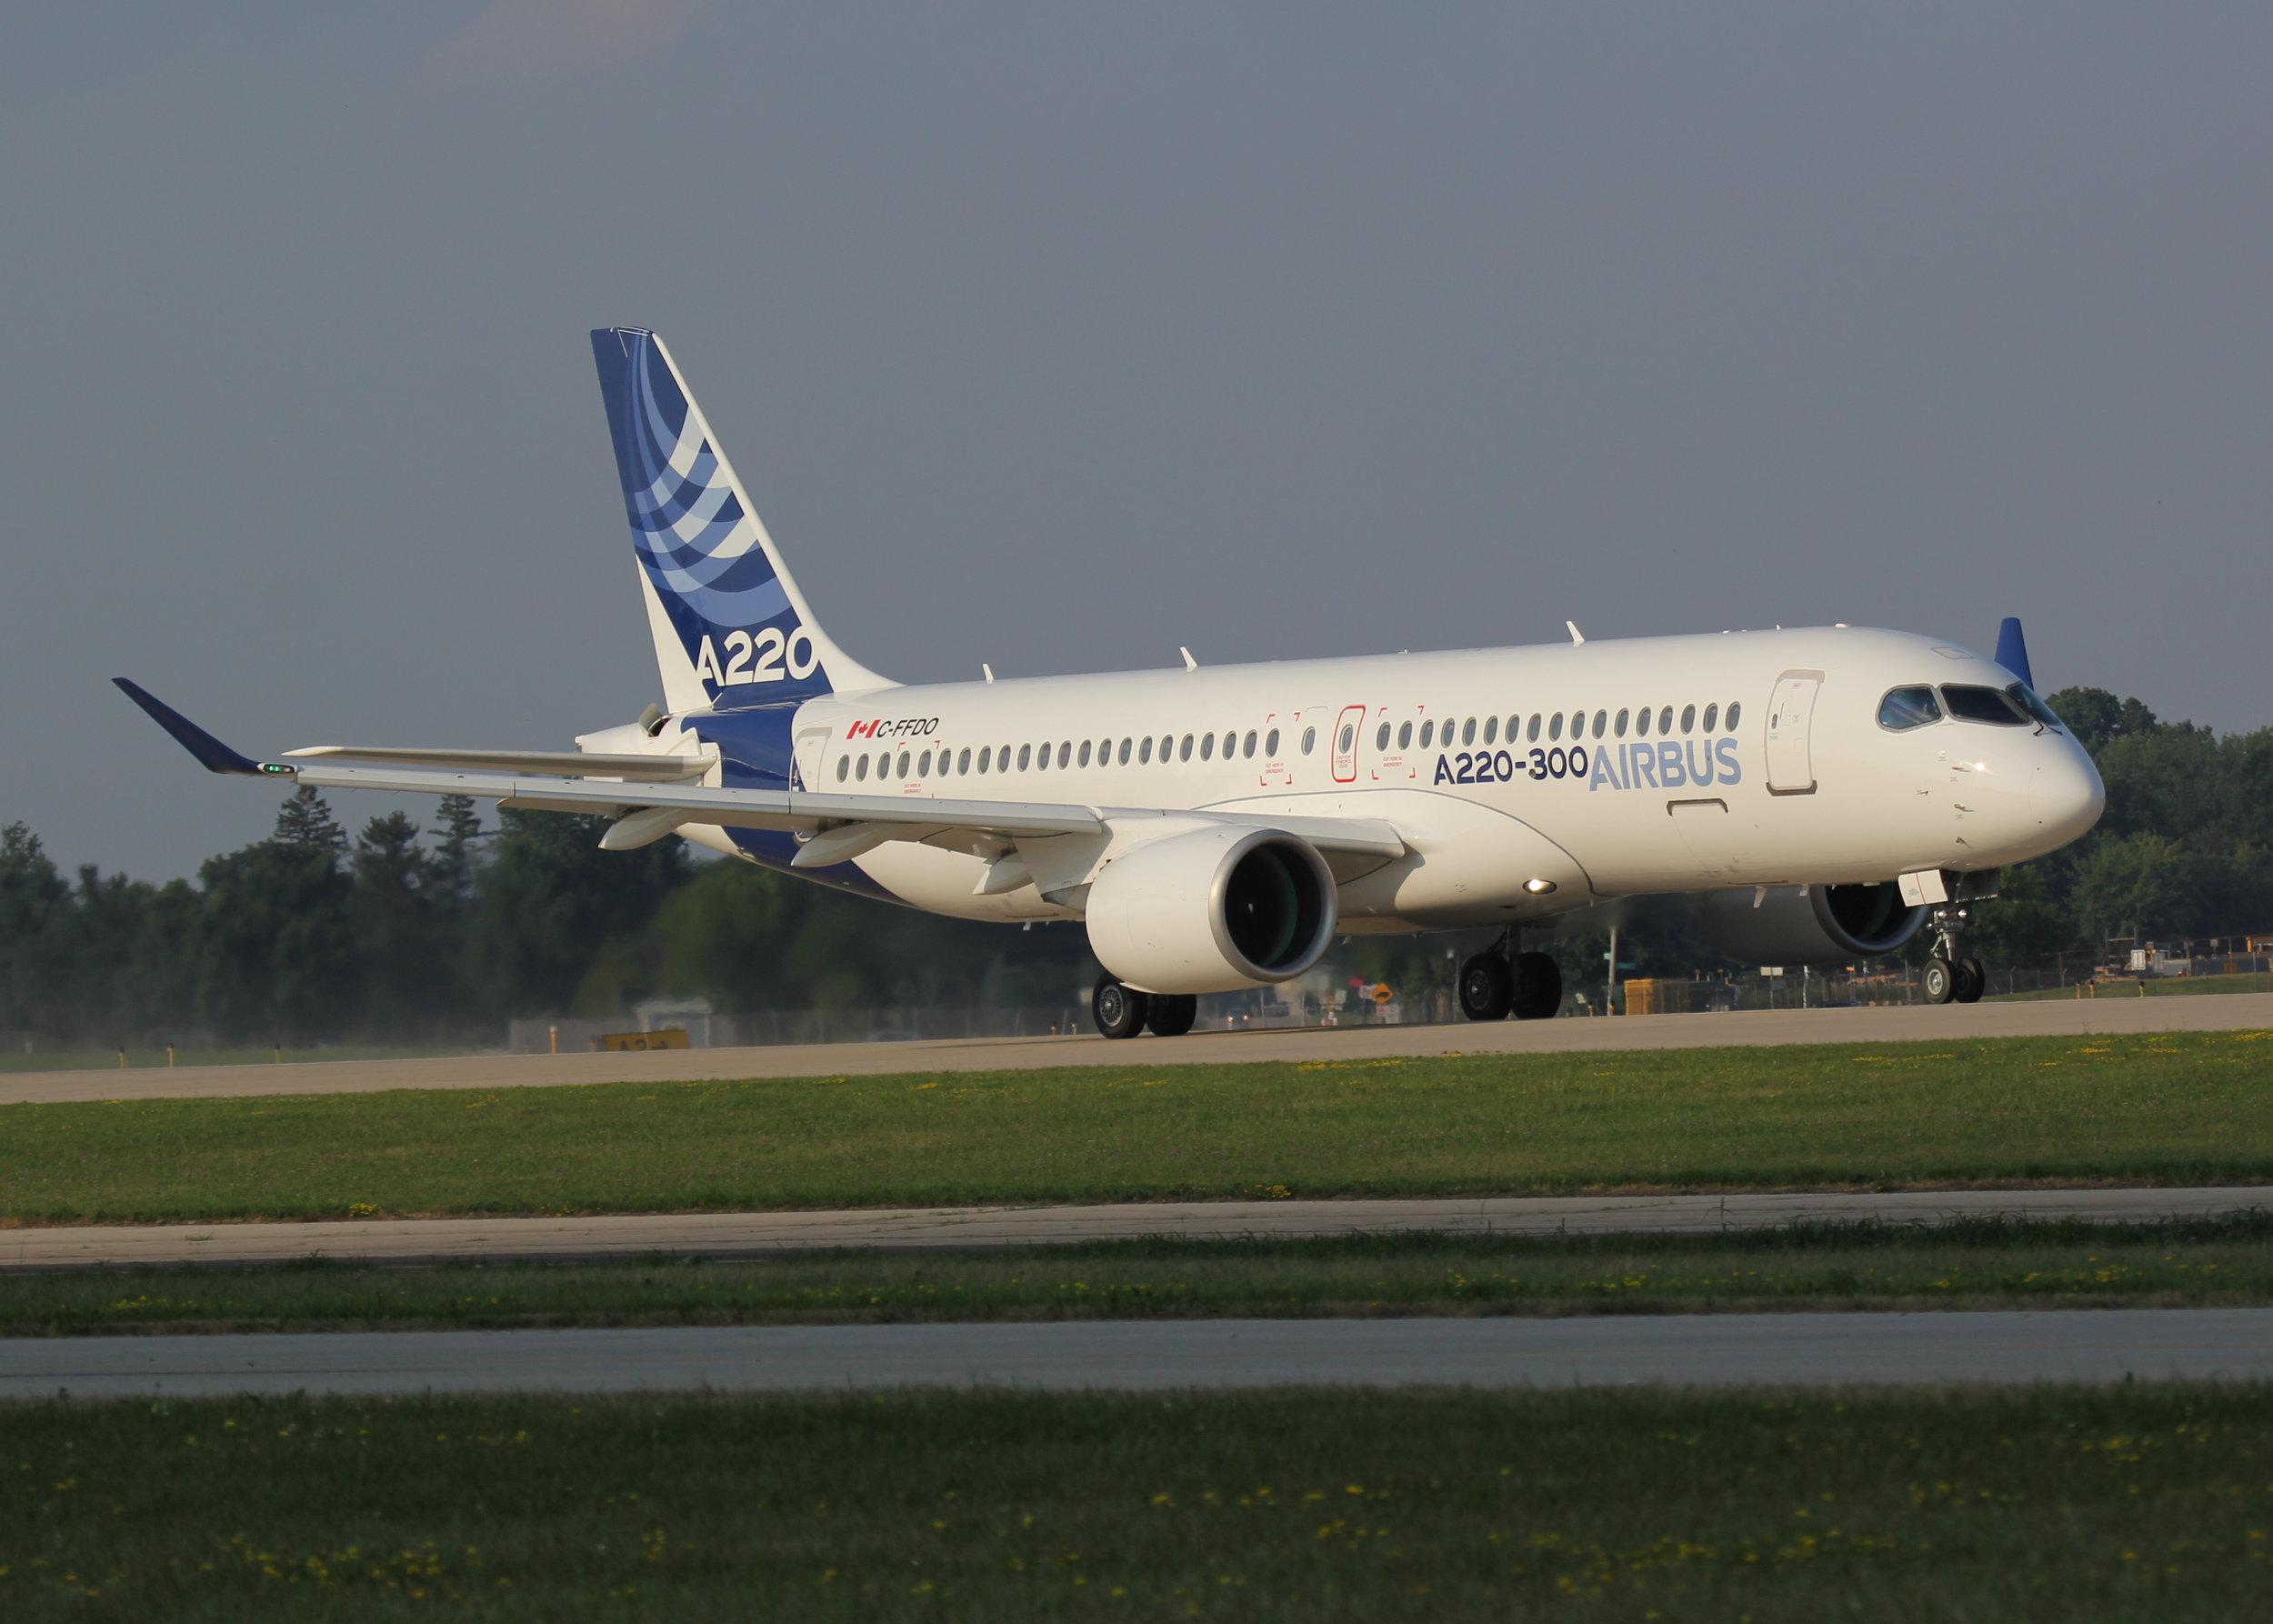 C-FFDO Airbus A220-300 taken at Oshkosh 24th July 2018 by Alec Rankin